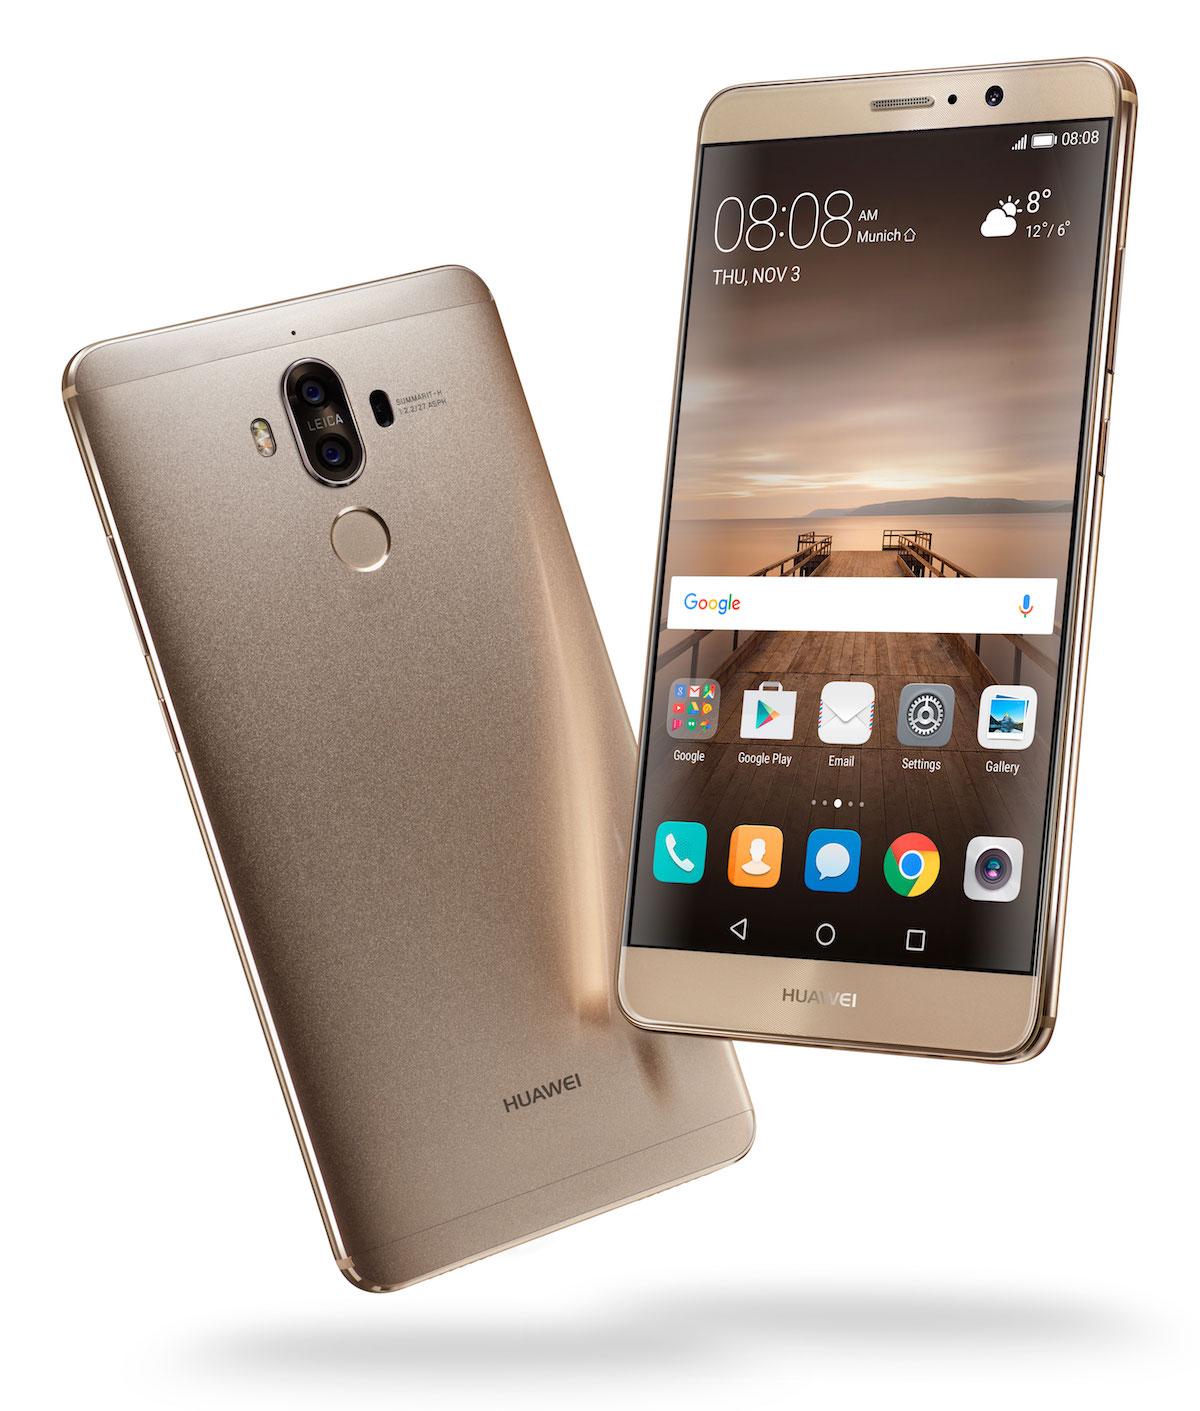 huawei mate 9 to obecnie najszybszy smartfon z androidem na rynku. Black Bedroom Furniture Sets. Home Design Ideas